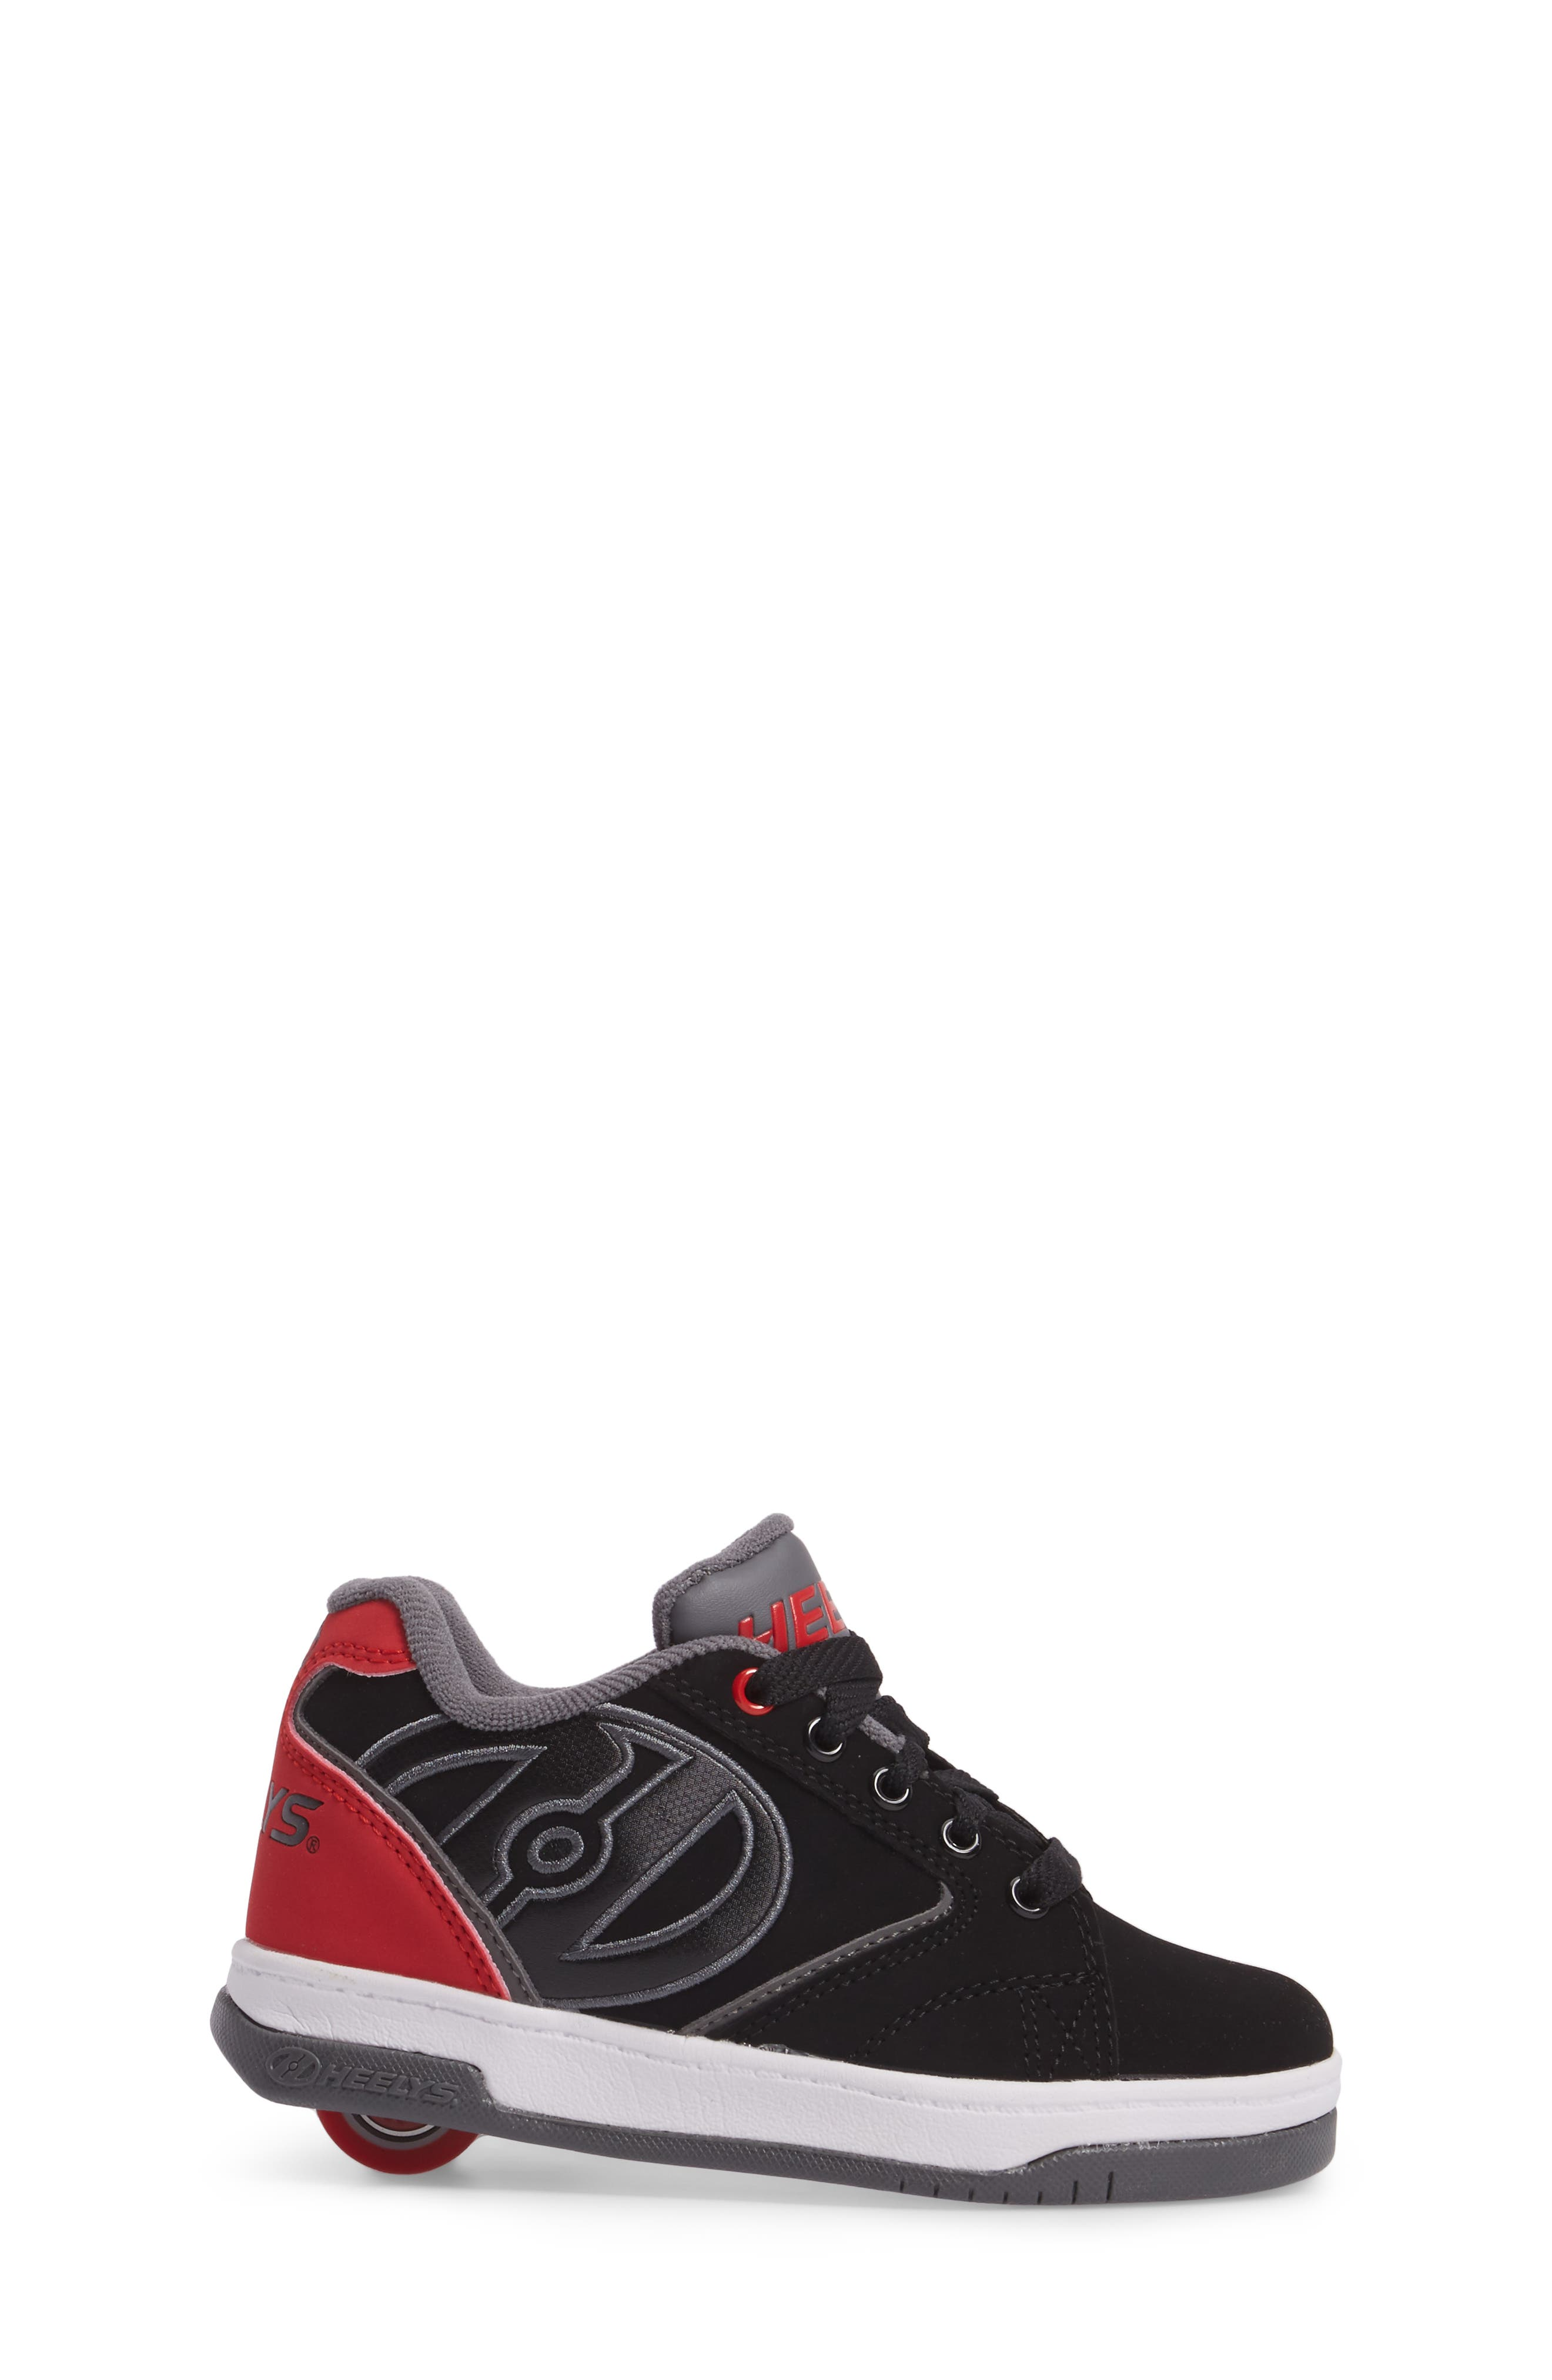 Heeleys'Propel 2.0' Sneaker,                             Alternate thumbnail 3, color,                             BLACK/ RED/ GREY